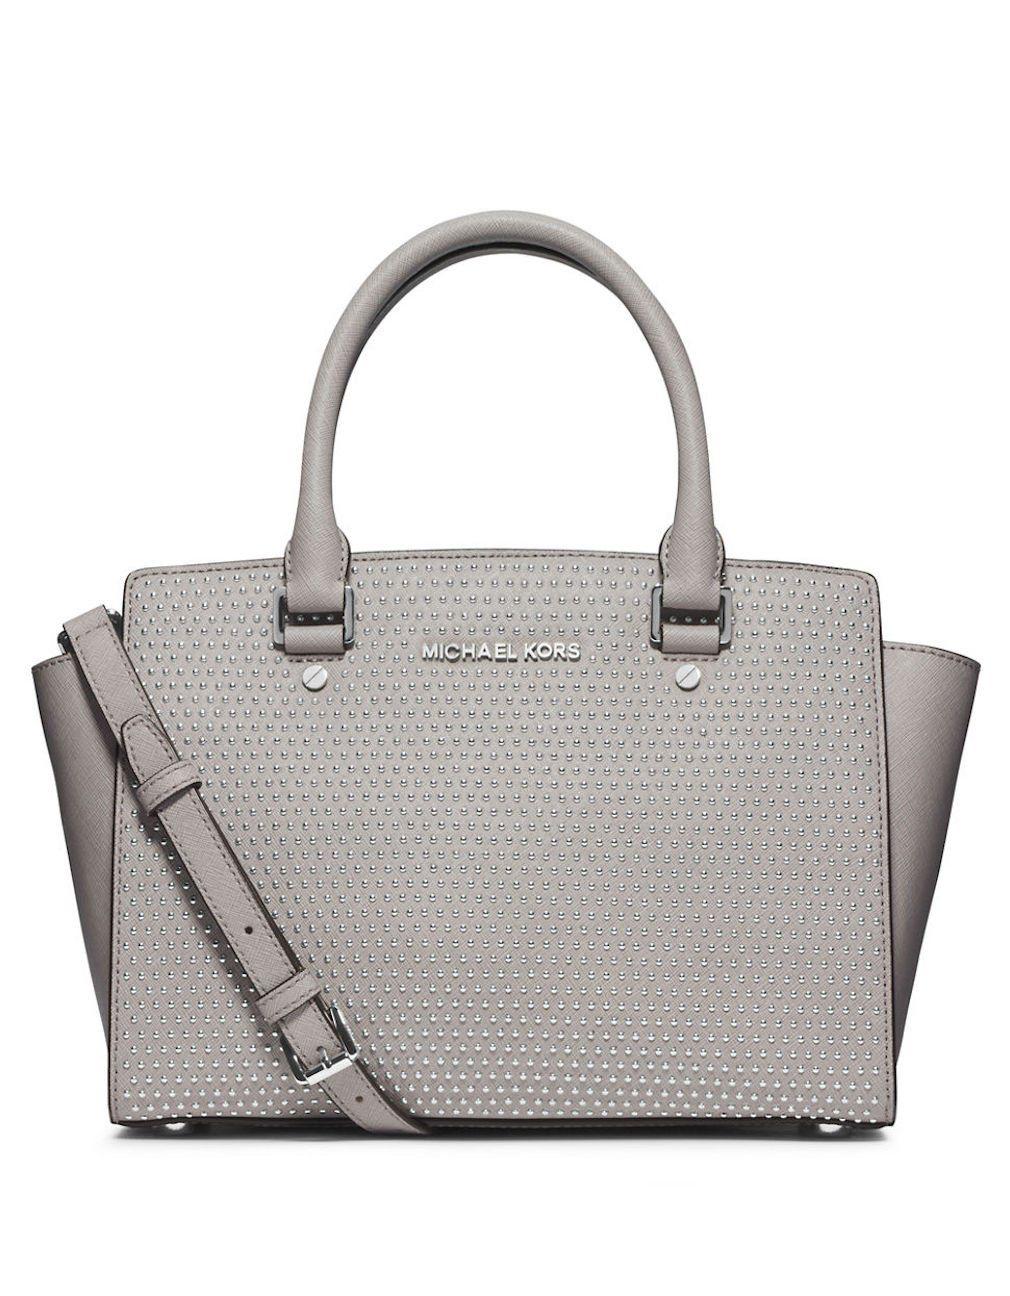 8e6947f8e771 Michael Kors Micro Stud Selma Md Satchel Pearl Grey Leather  Handbags   Amazon.com